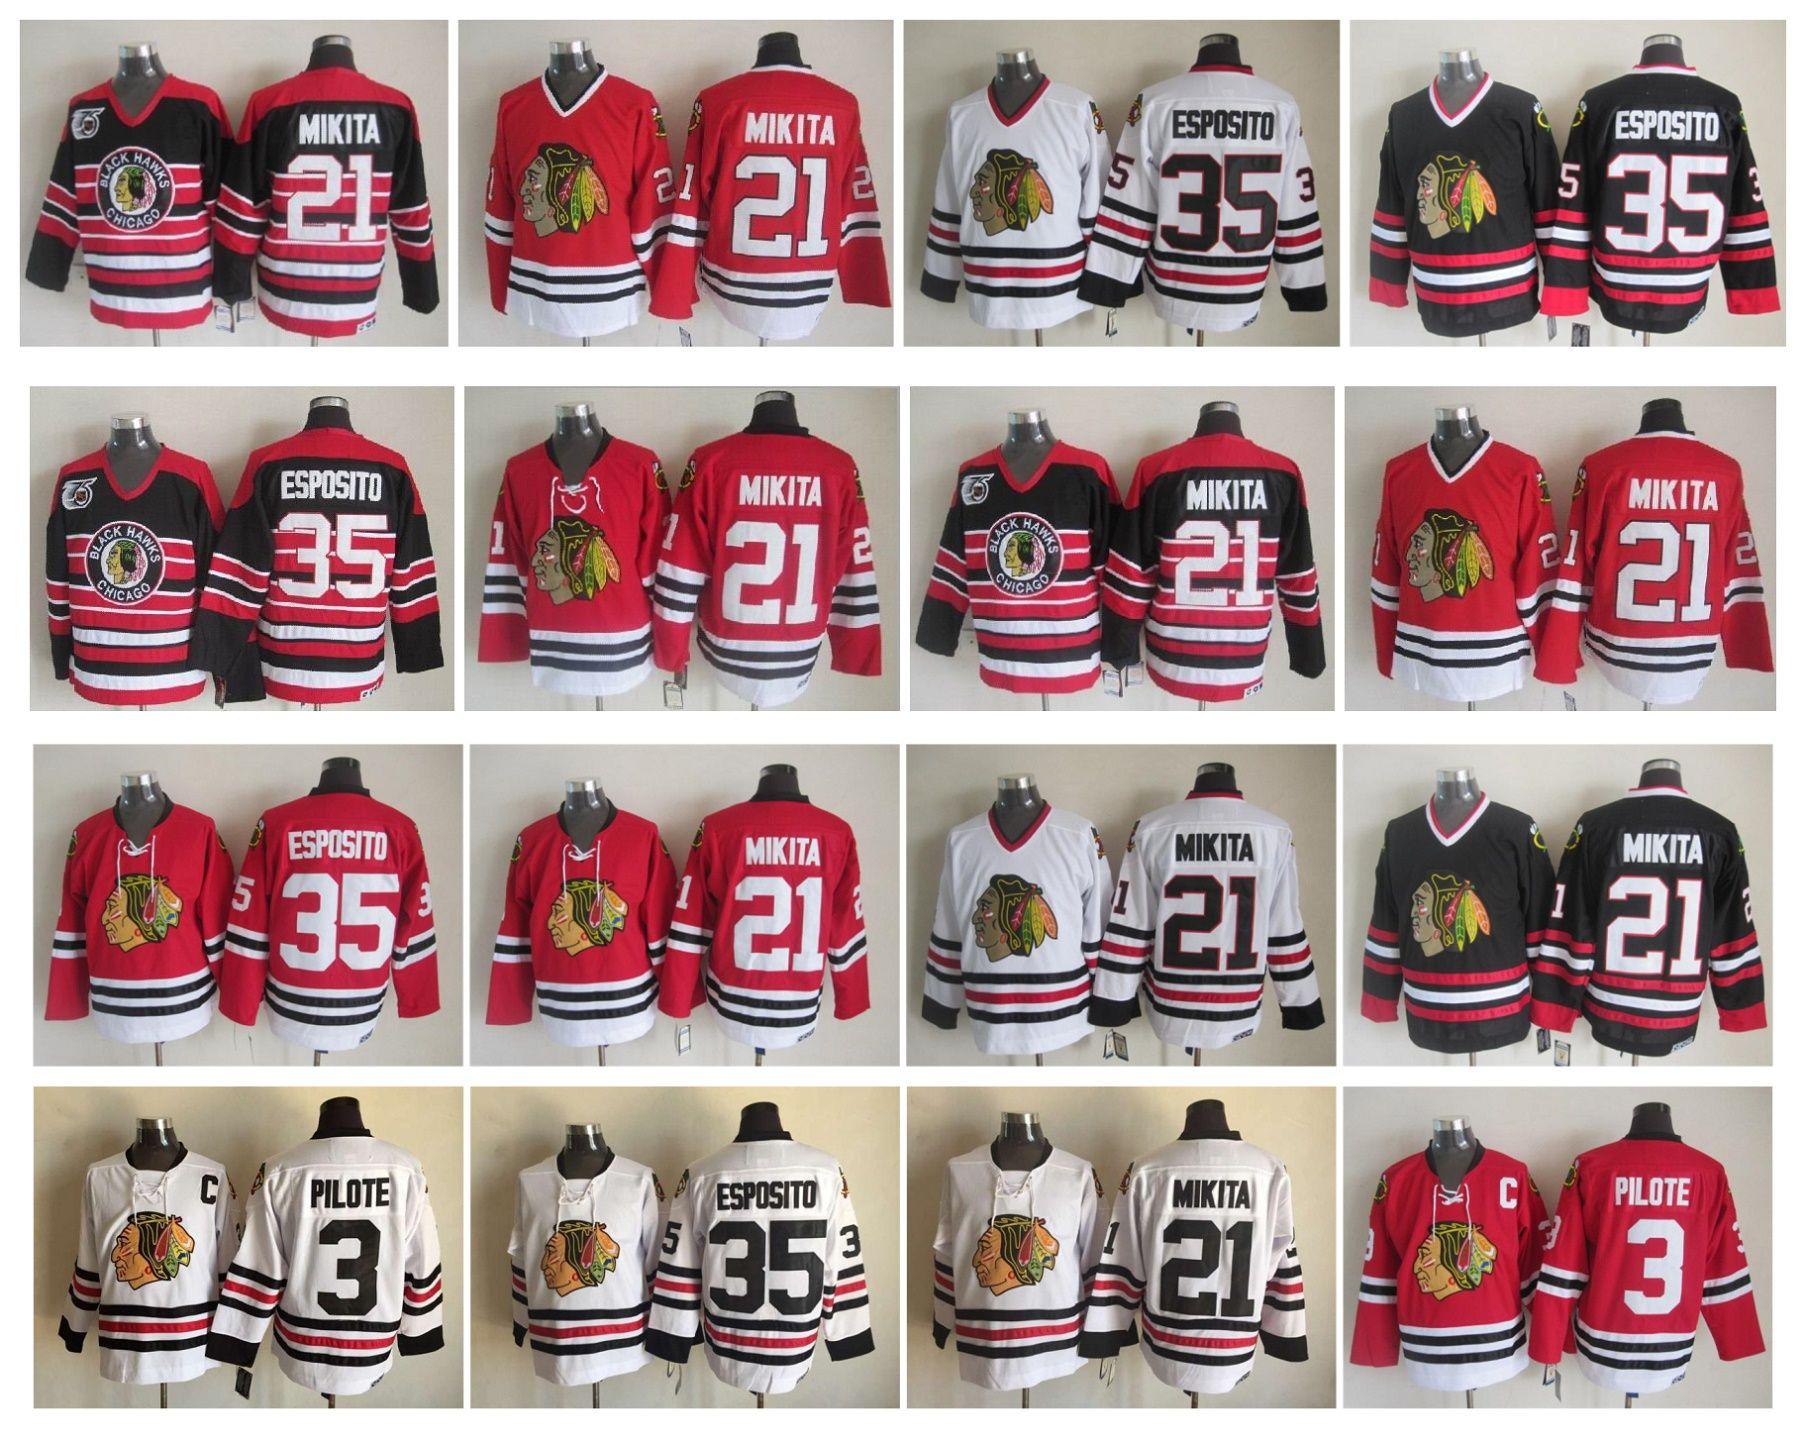 Camisola de hóquei de Chicago Blackhawks 21 Stan Mikita 3 Pierre Pilote 35 Camisas de 100% costuradas de CCM 100 autêntico Tony Esposito Vintage